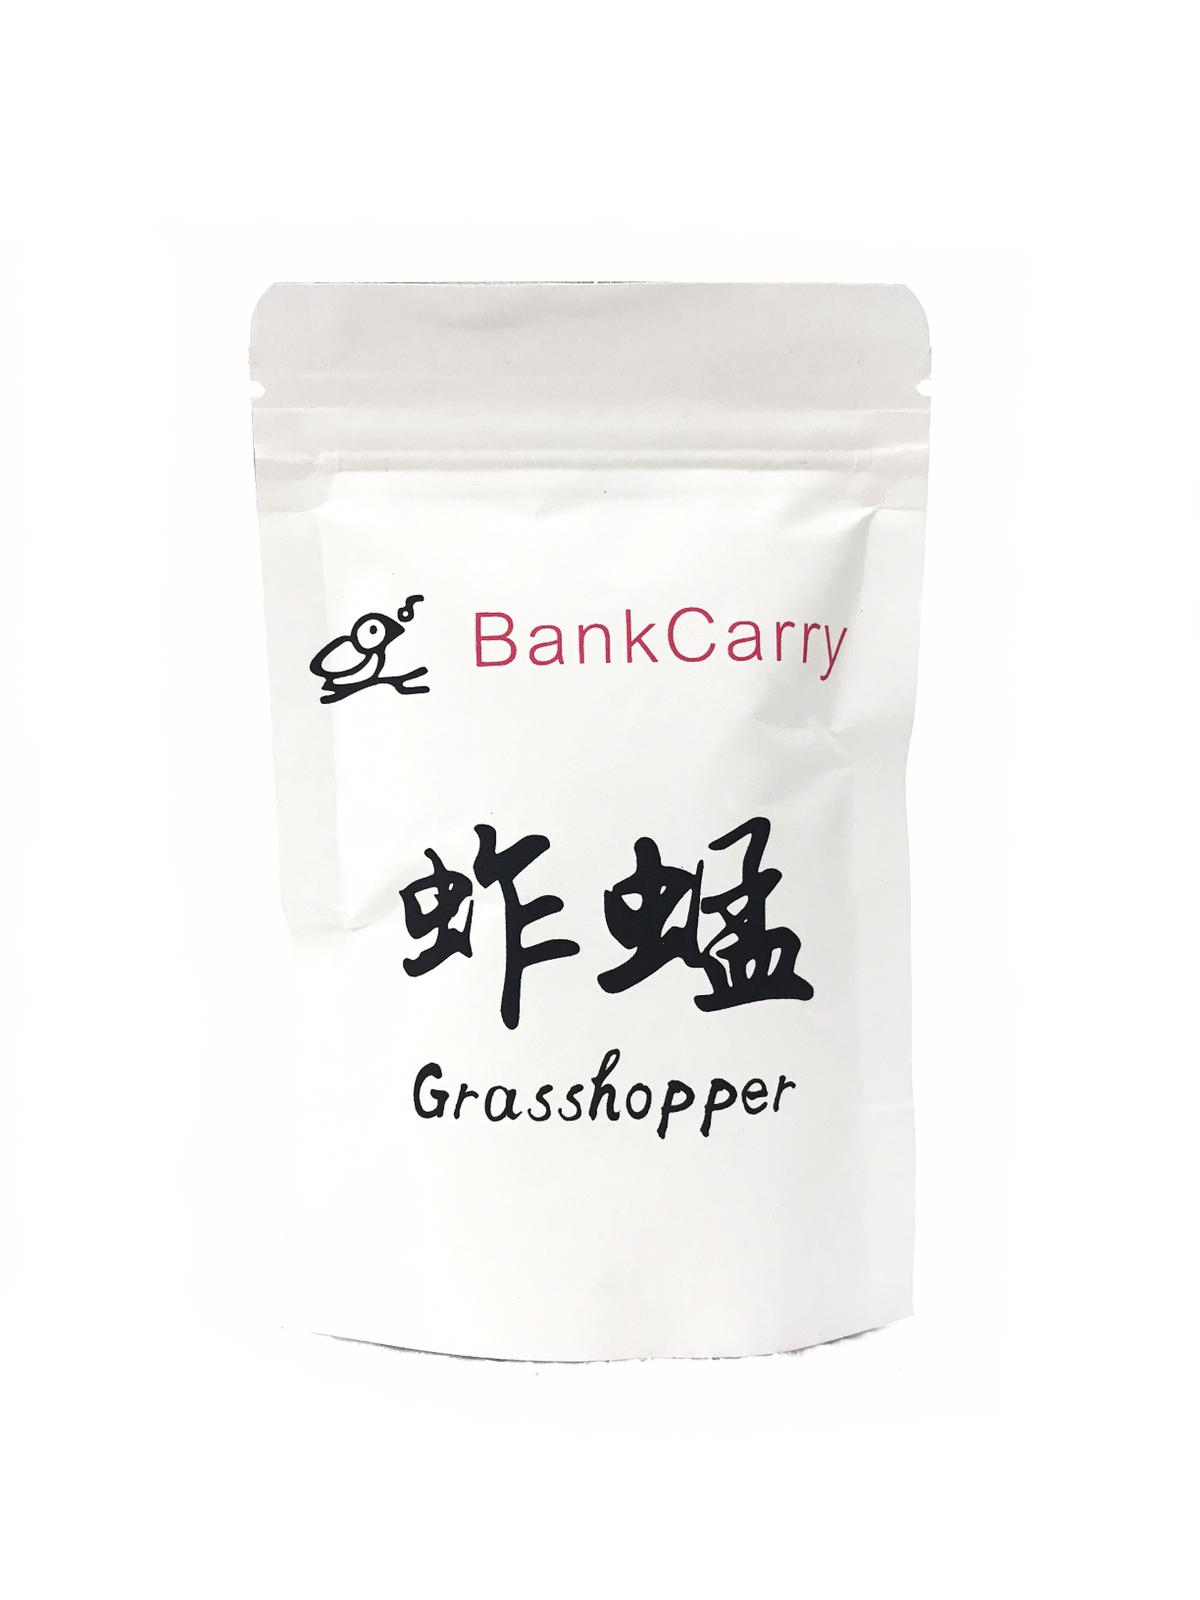 Bankcarry Grasshopper